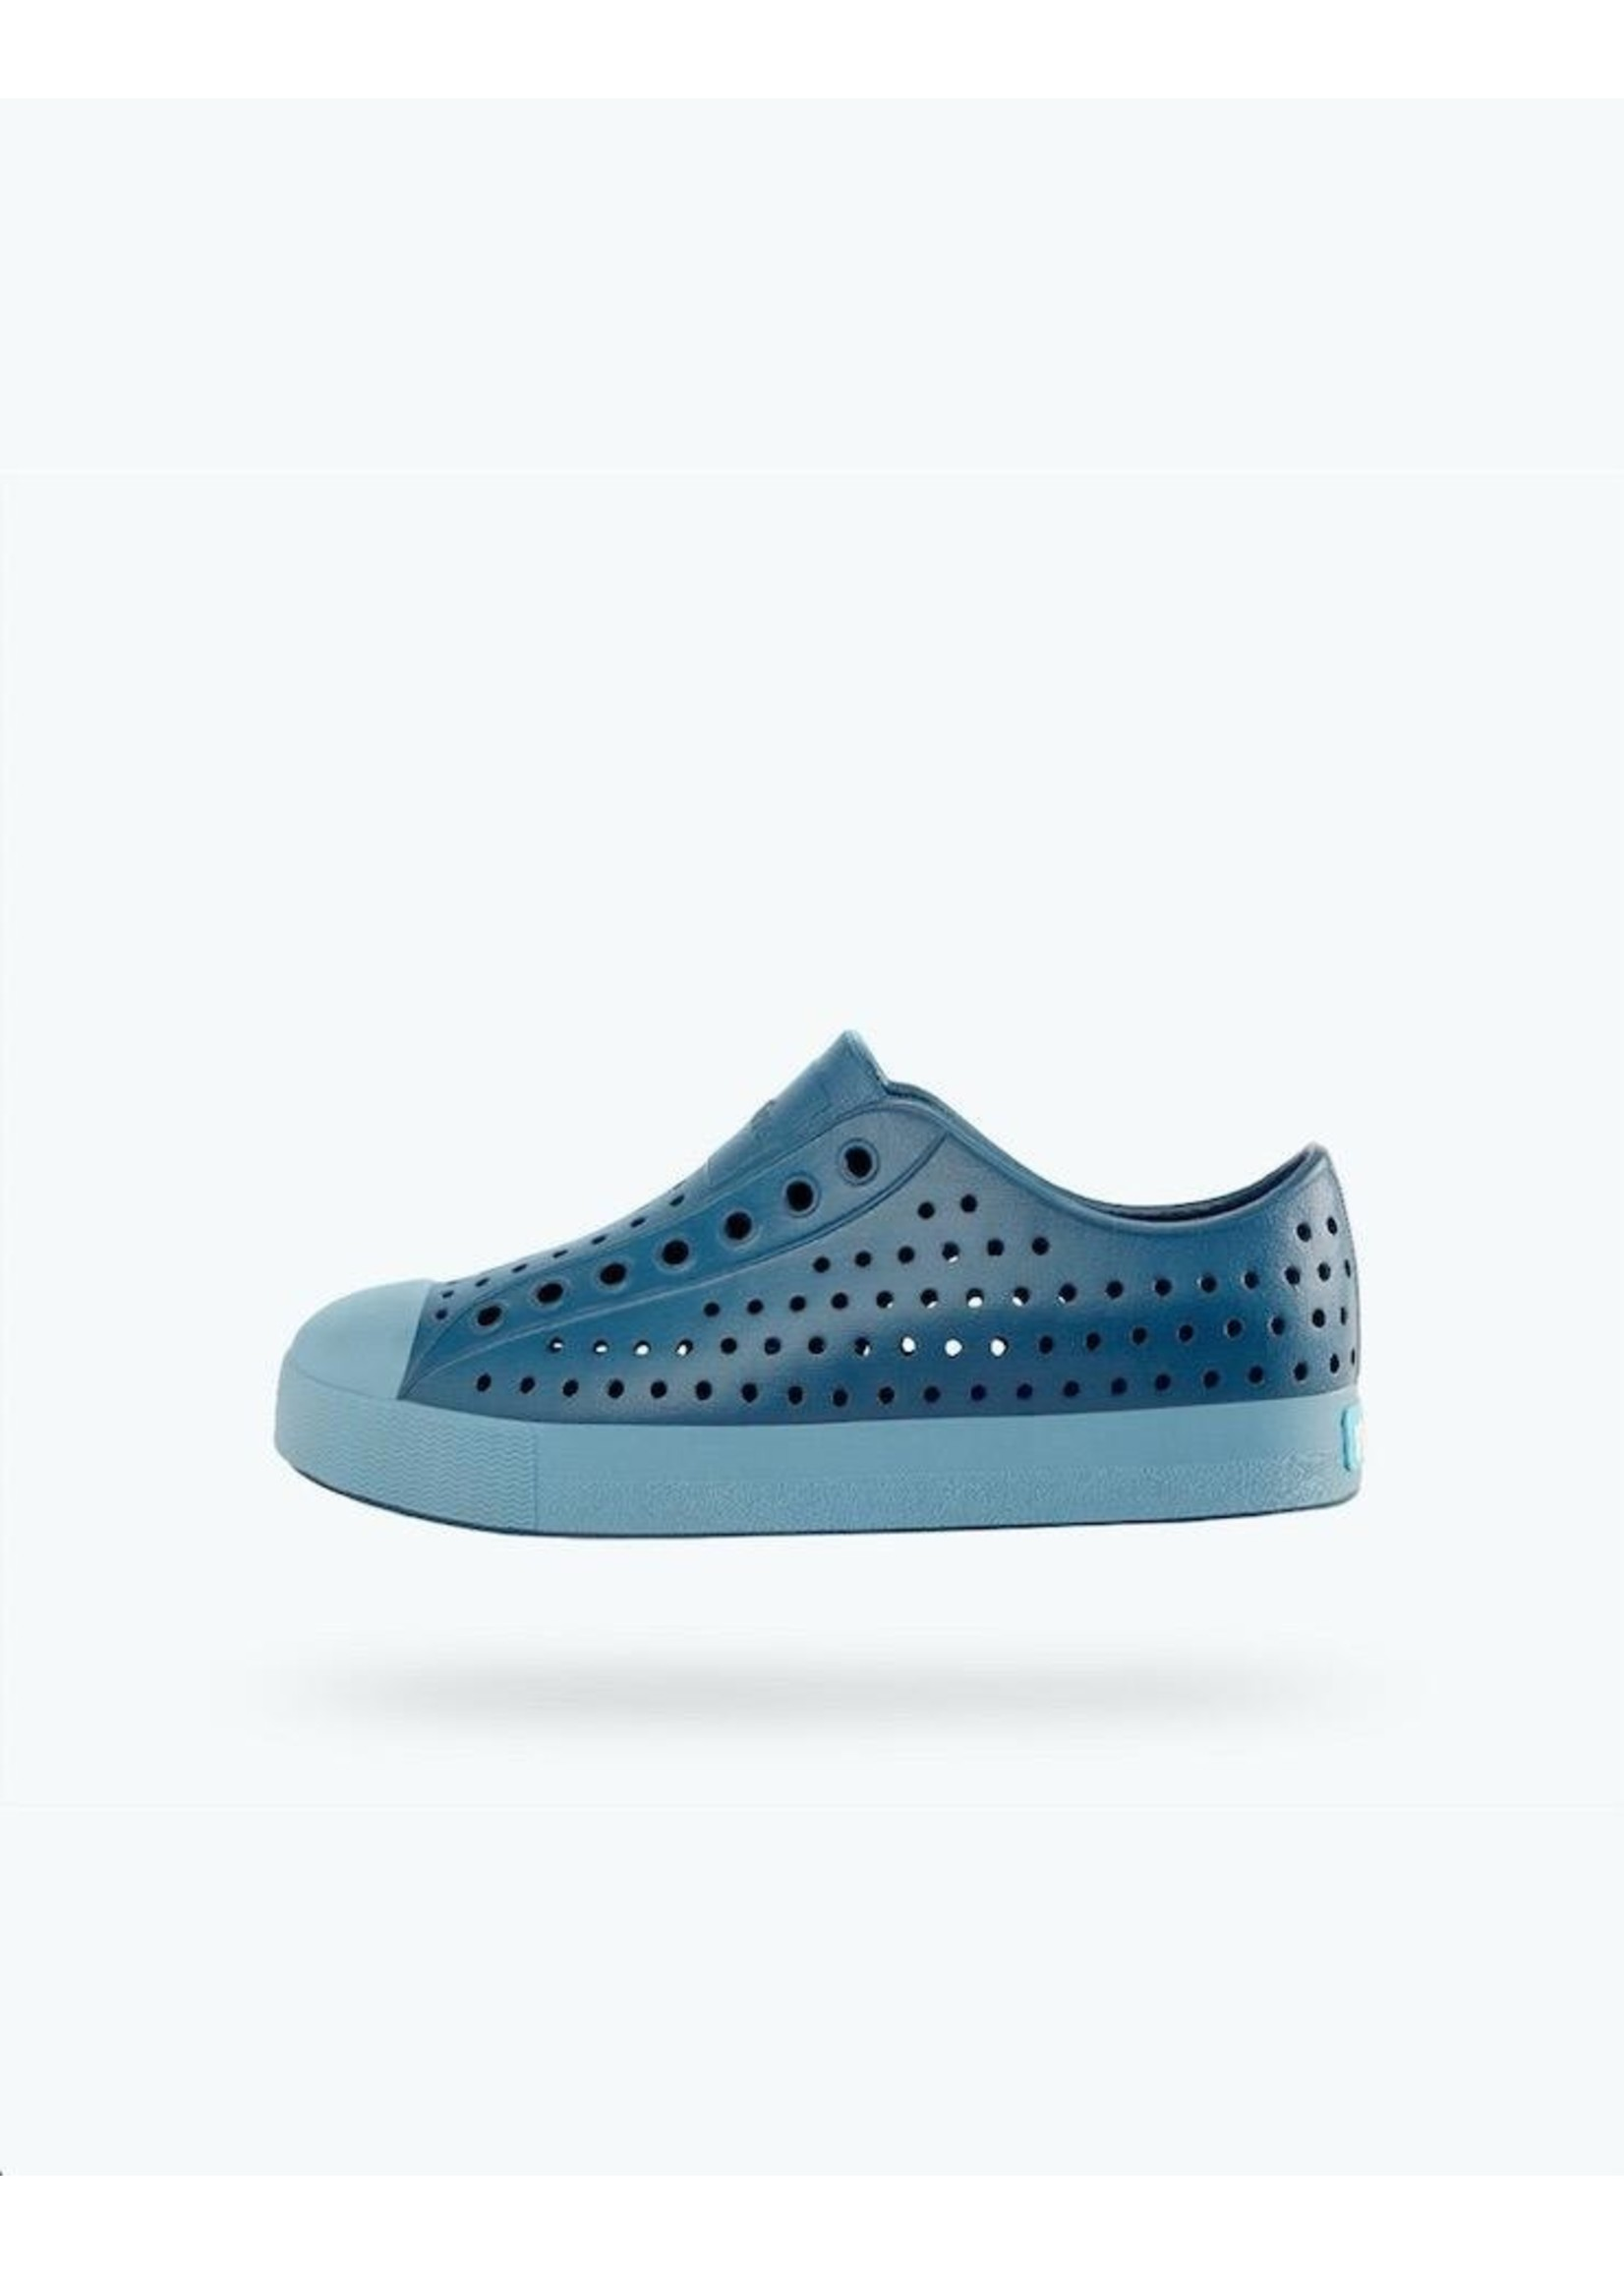 Native Shoes Native Shoes, Jefferson Child Challenger Blue/ Still Blue